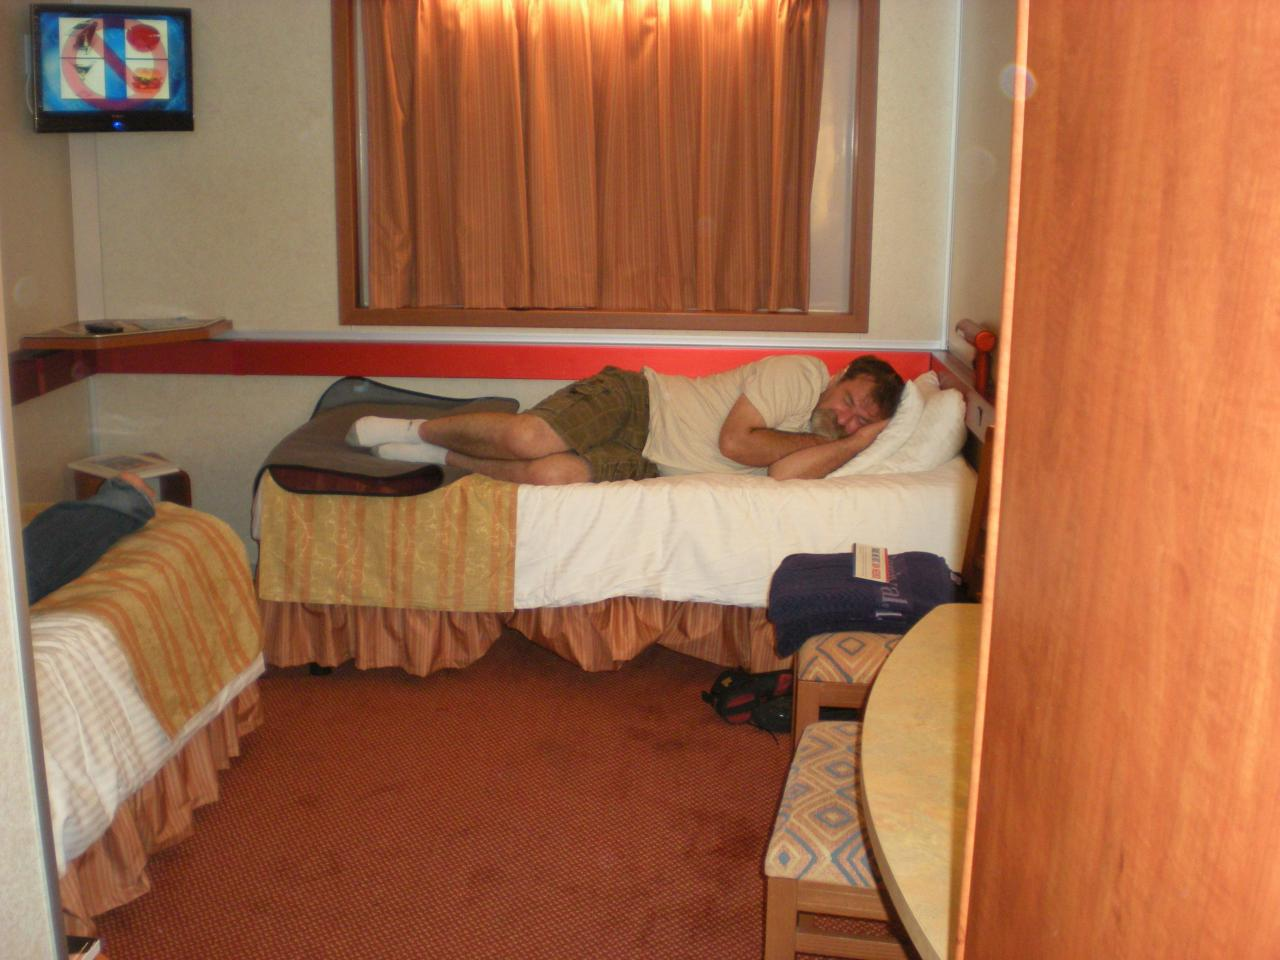 Carnival sensation cruise review for cabin e84 - Carnival sensation interior rooms ...